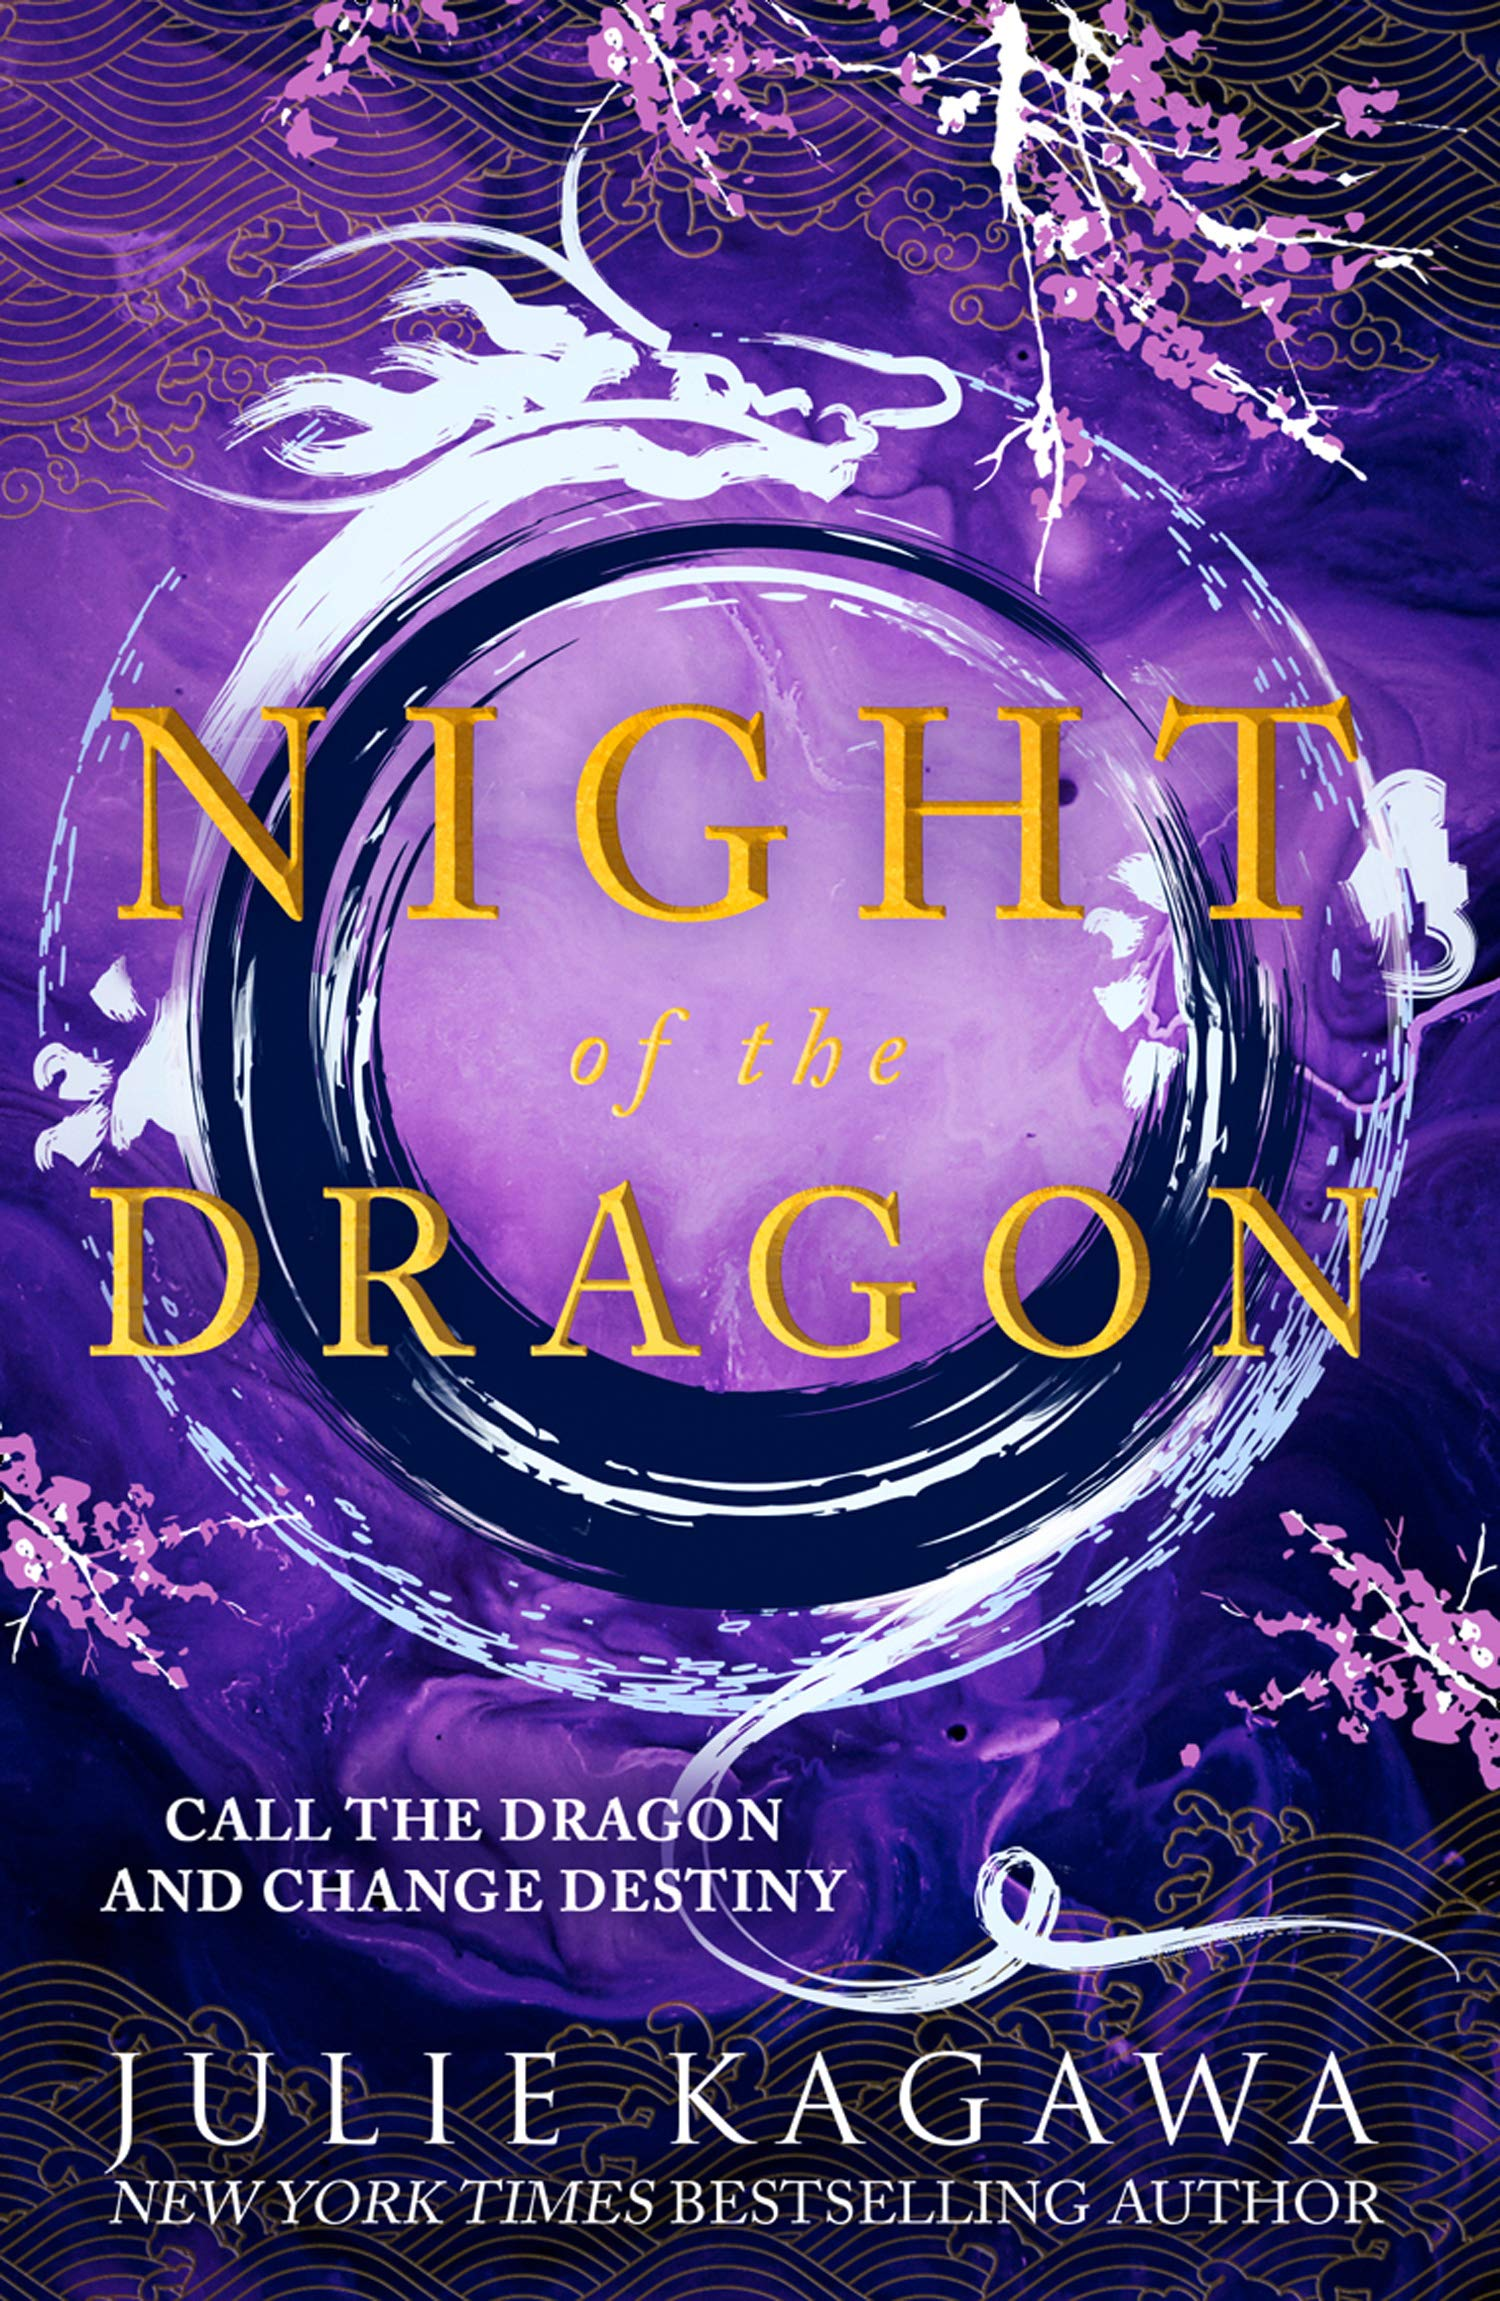 Night of the Dragon - Julie Kagawa